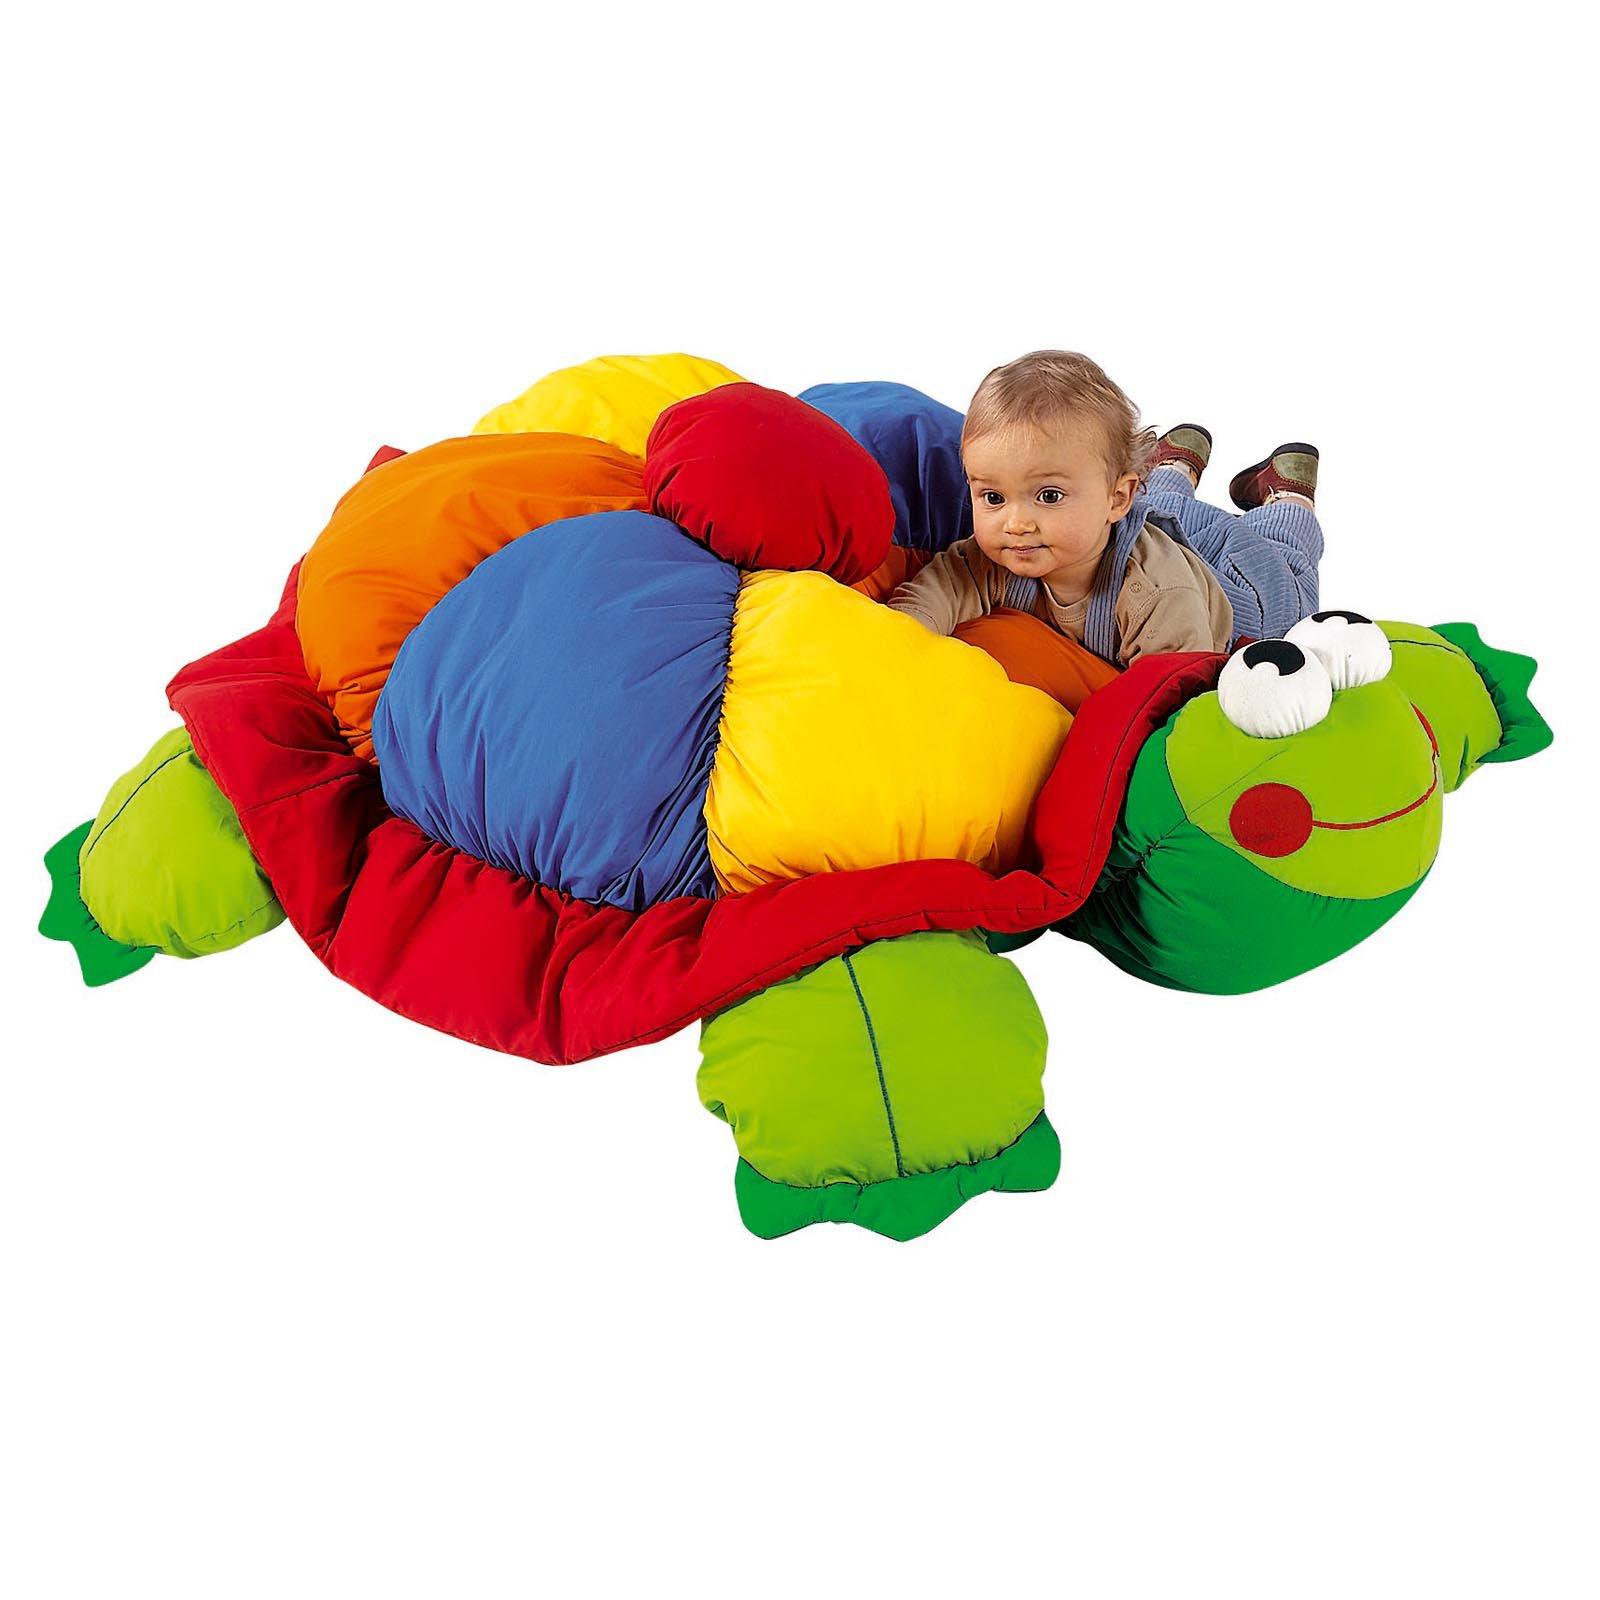 Wesco Trevor the Turtle Giant Floor Cushion